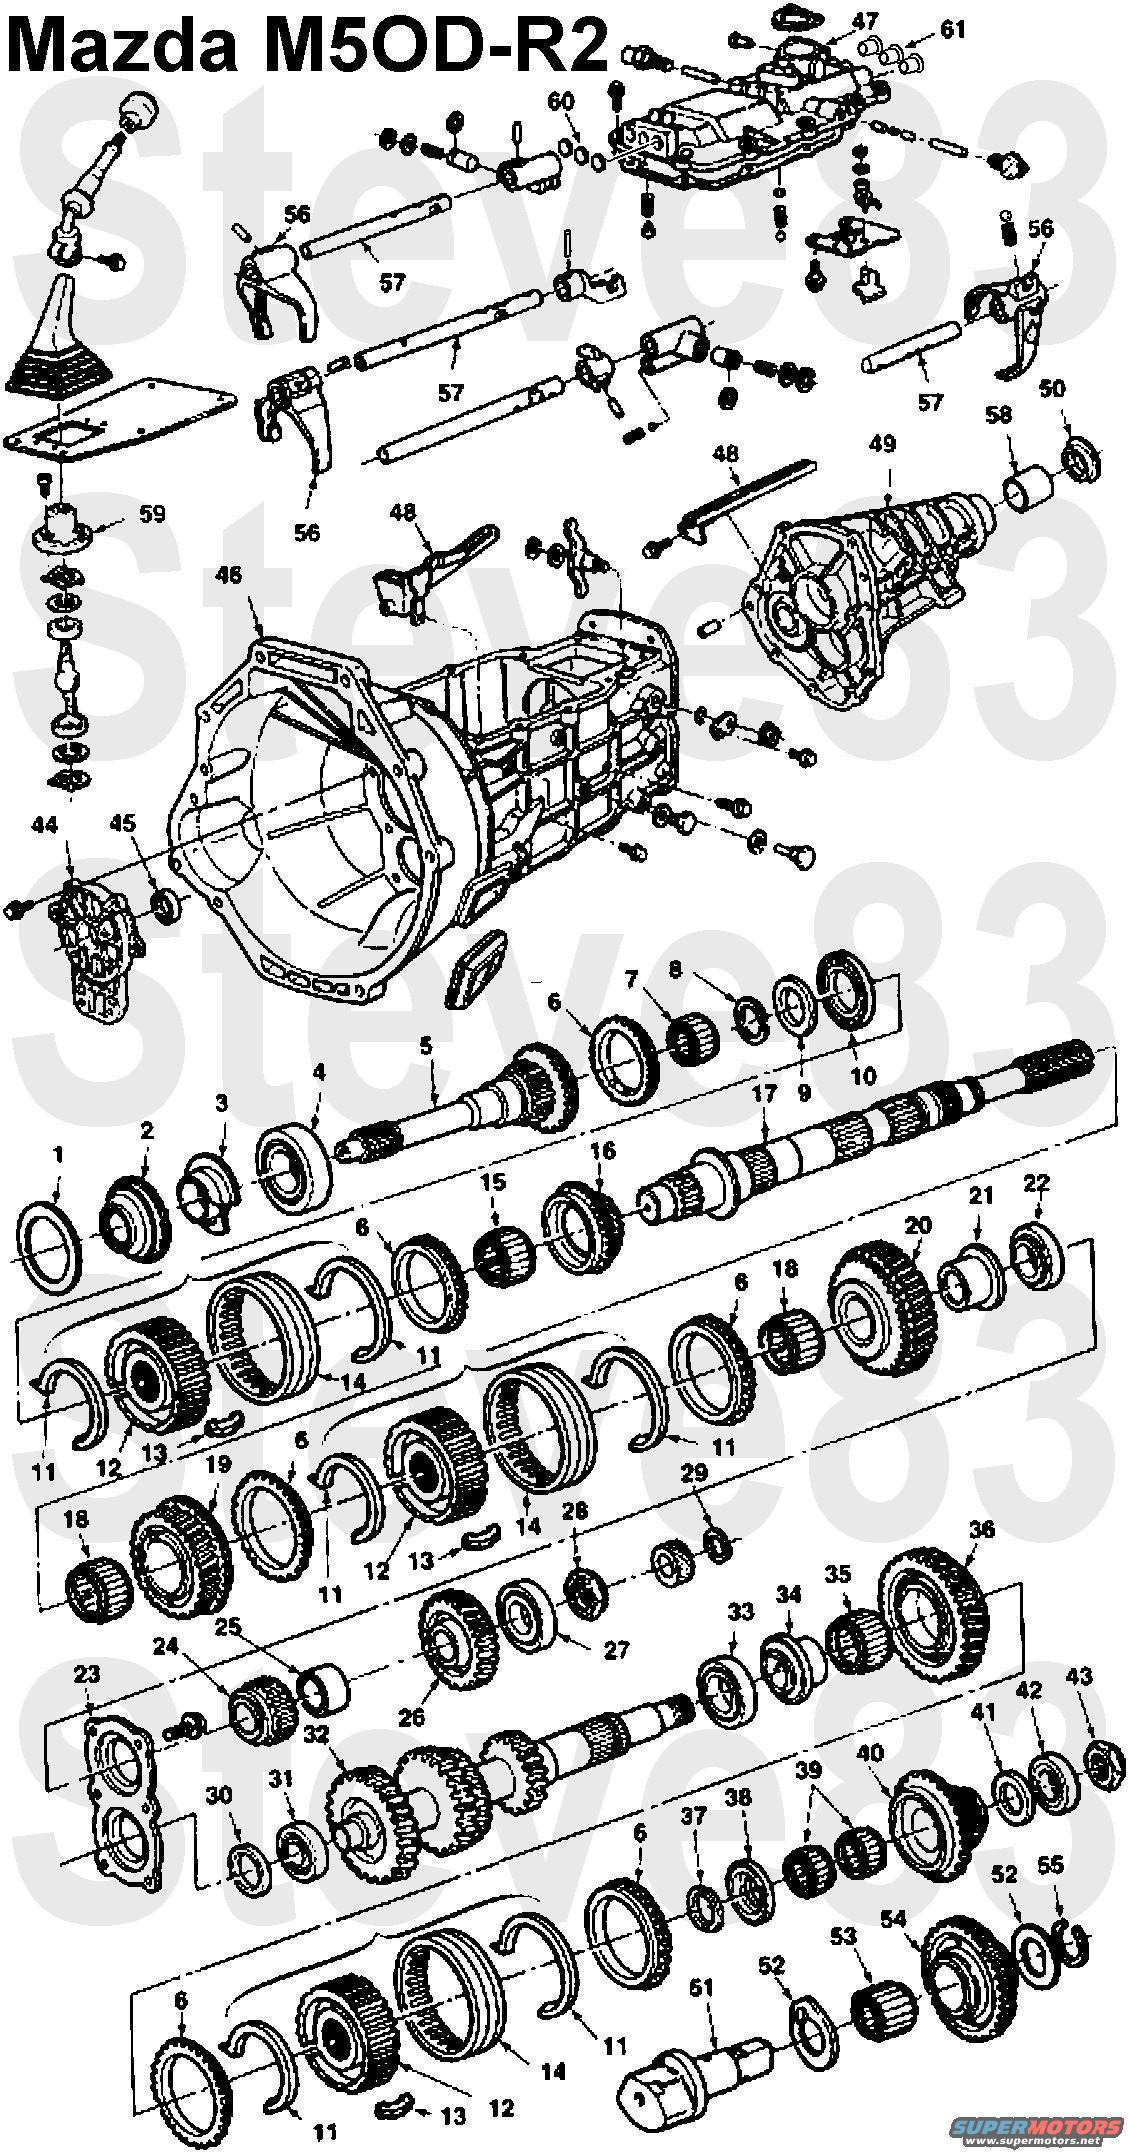 1983 Ford Bronco Diagrams Picture Supermotors Net